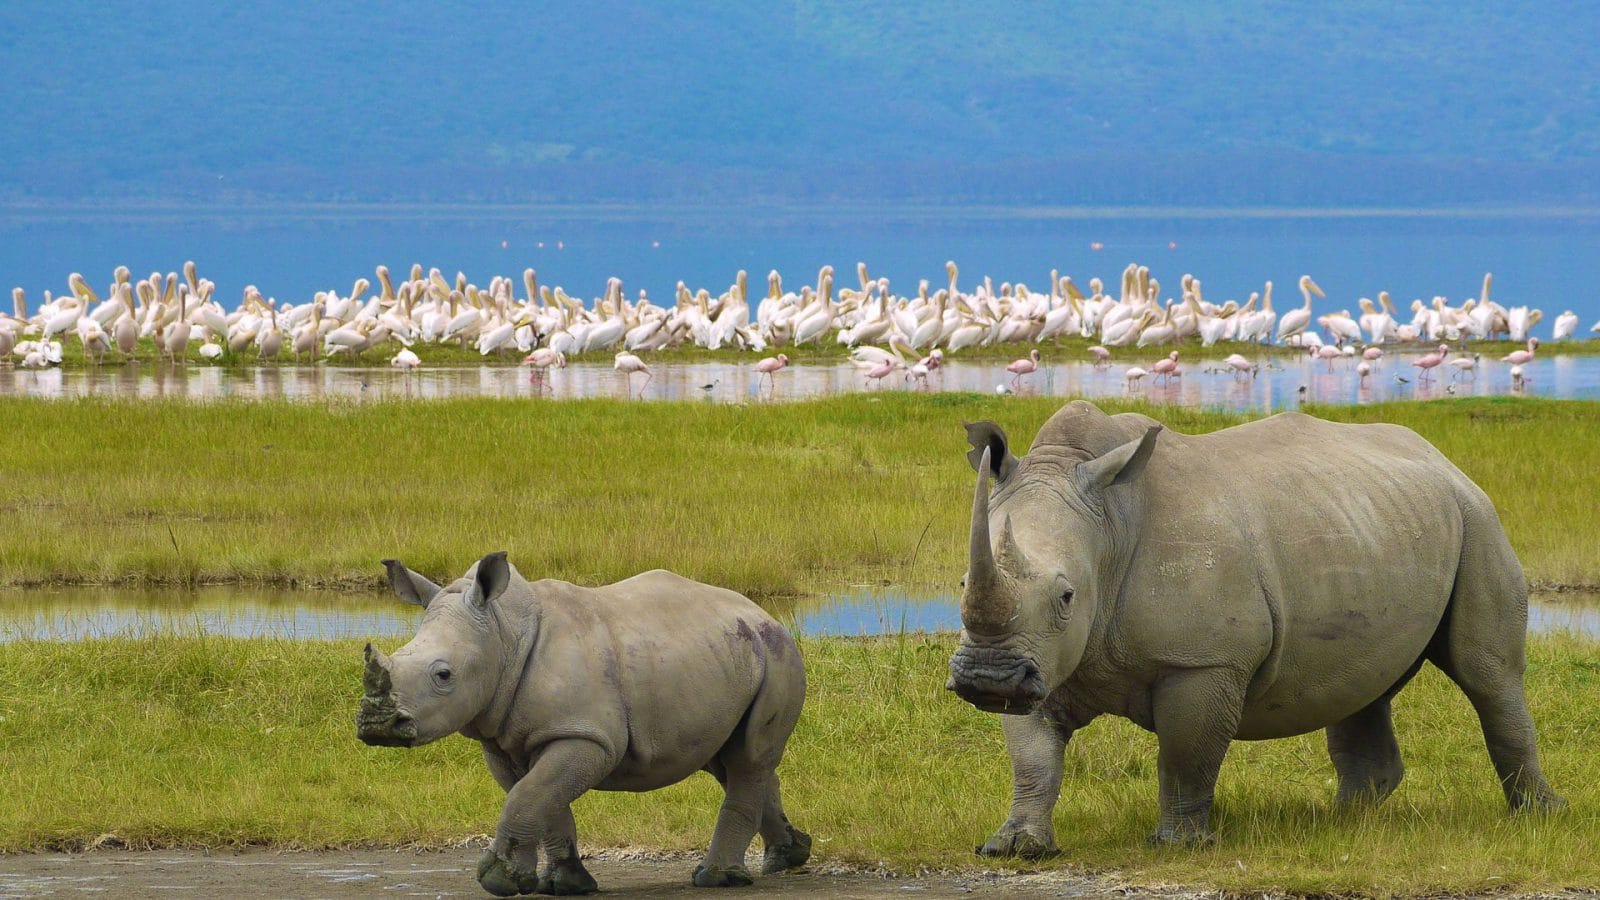 Mother rhino walking with baby rhino and flamingos in background at Lake Nakuru